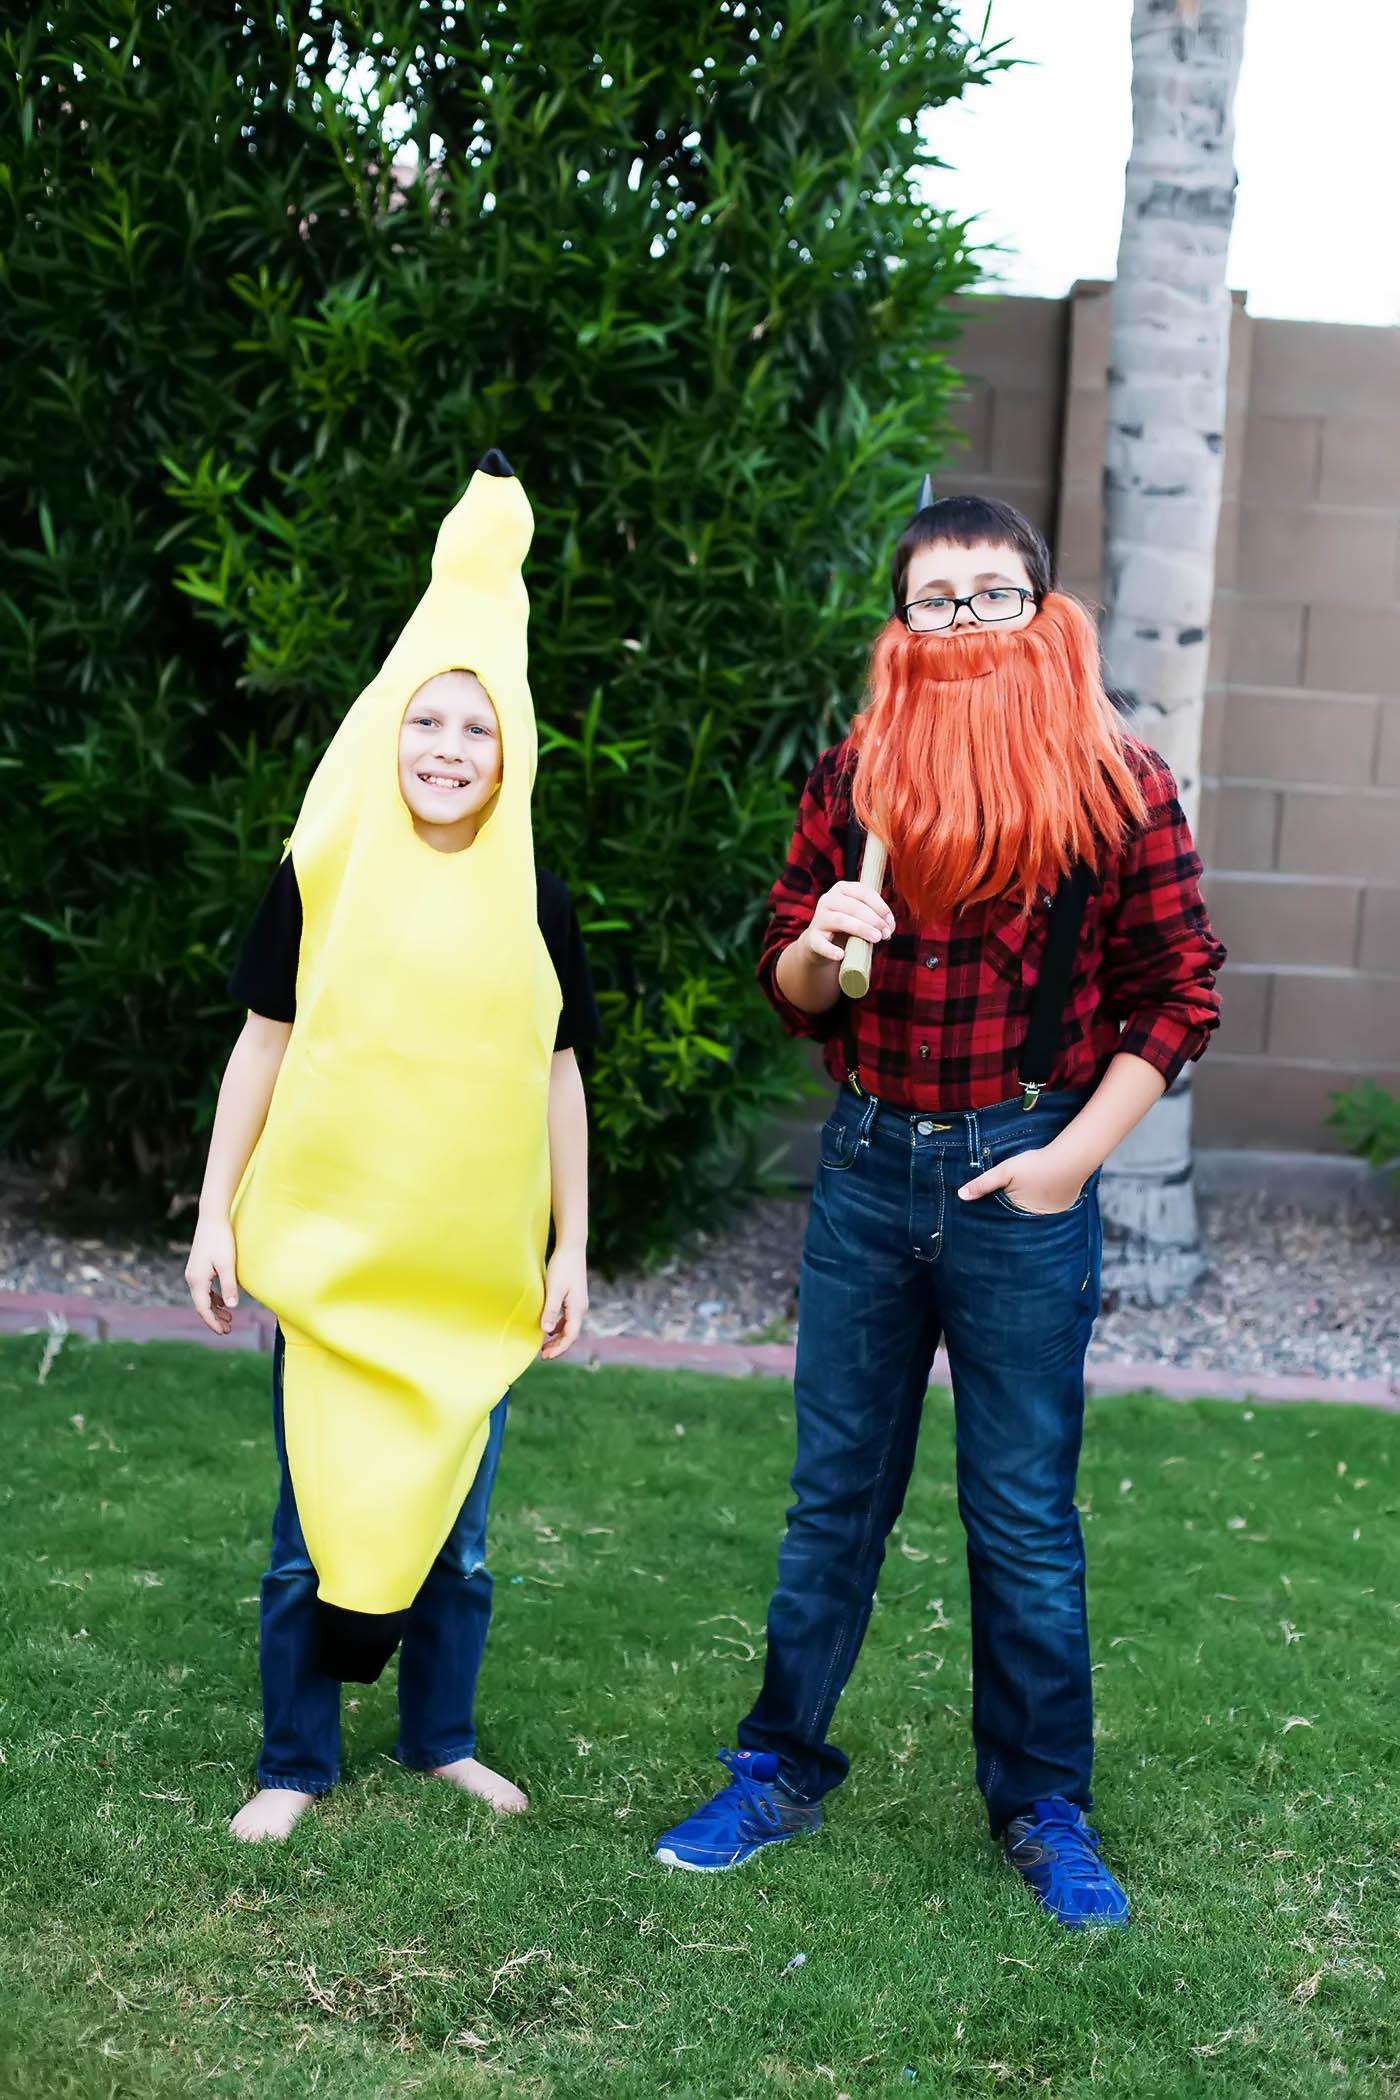 banana and lumberjack